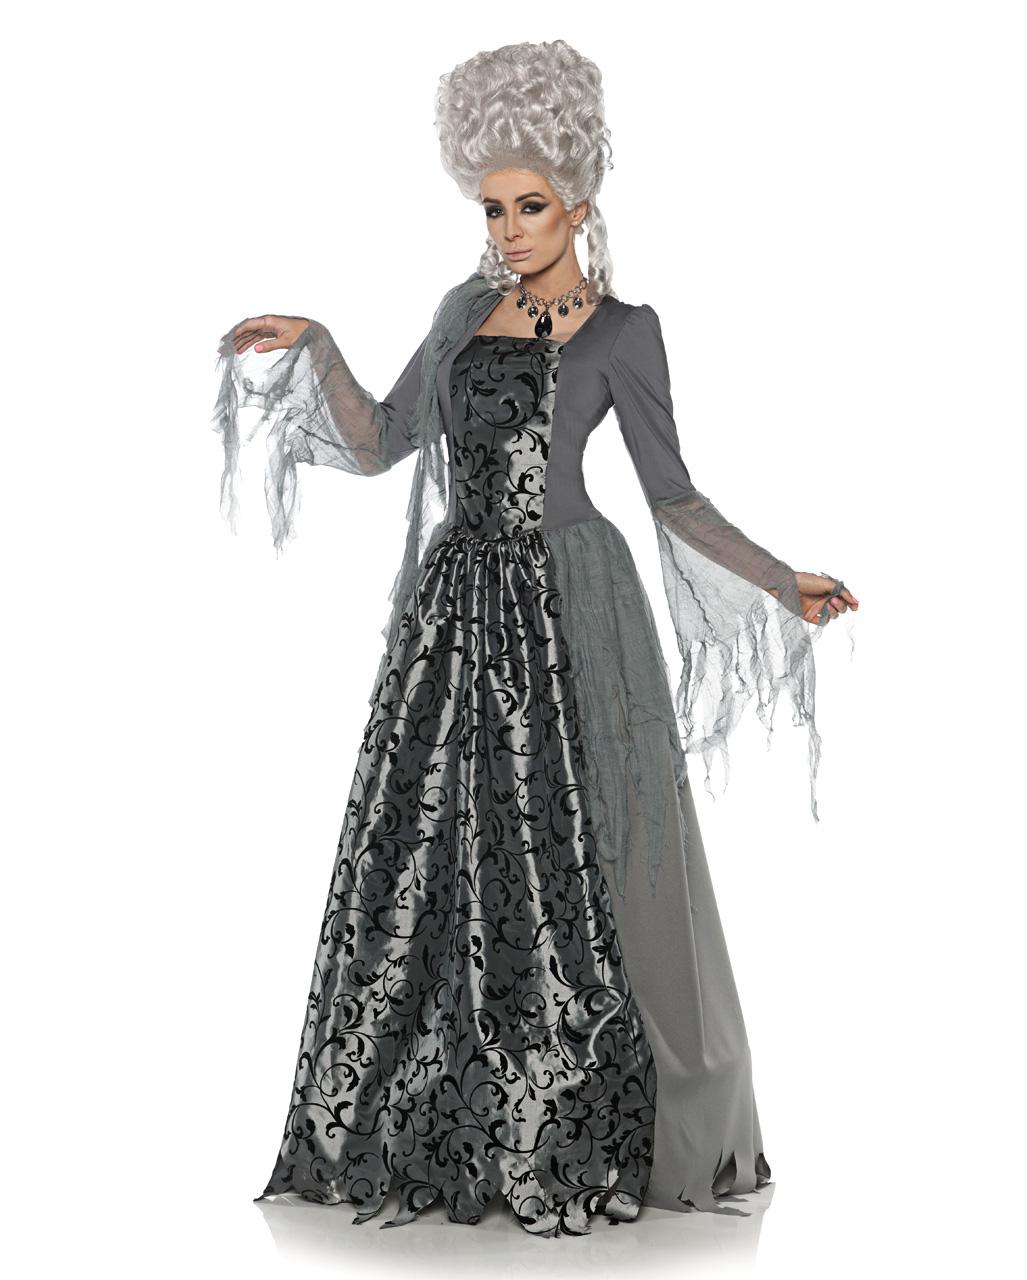 noblewoman ghosts costume halloween costumes   horror-shop